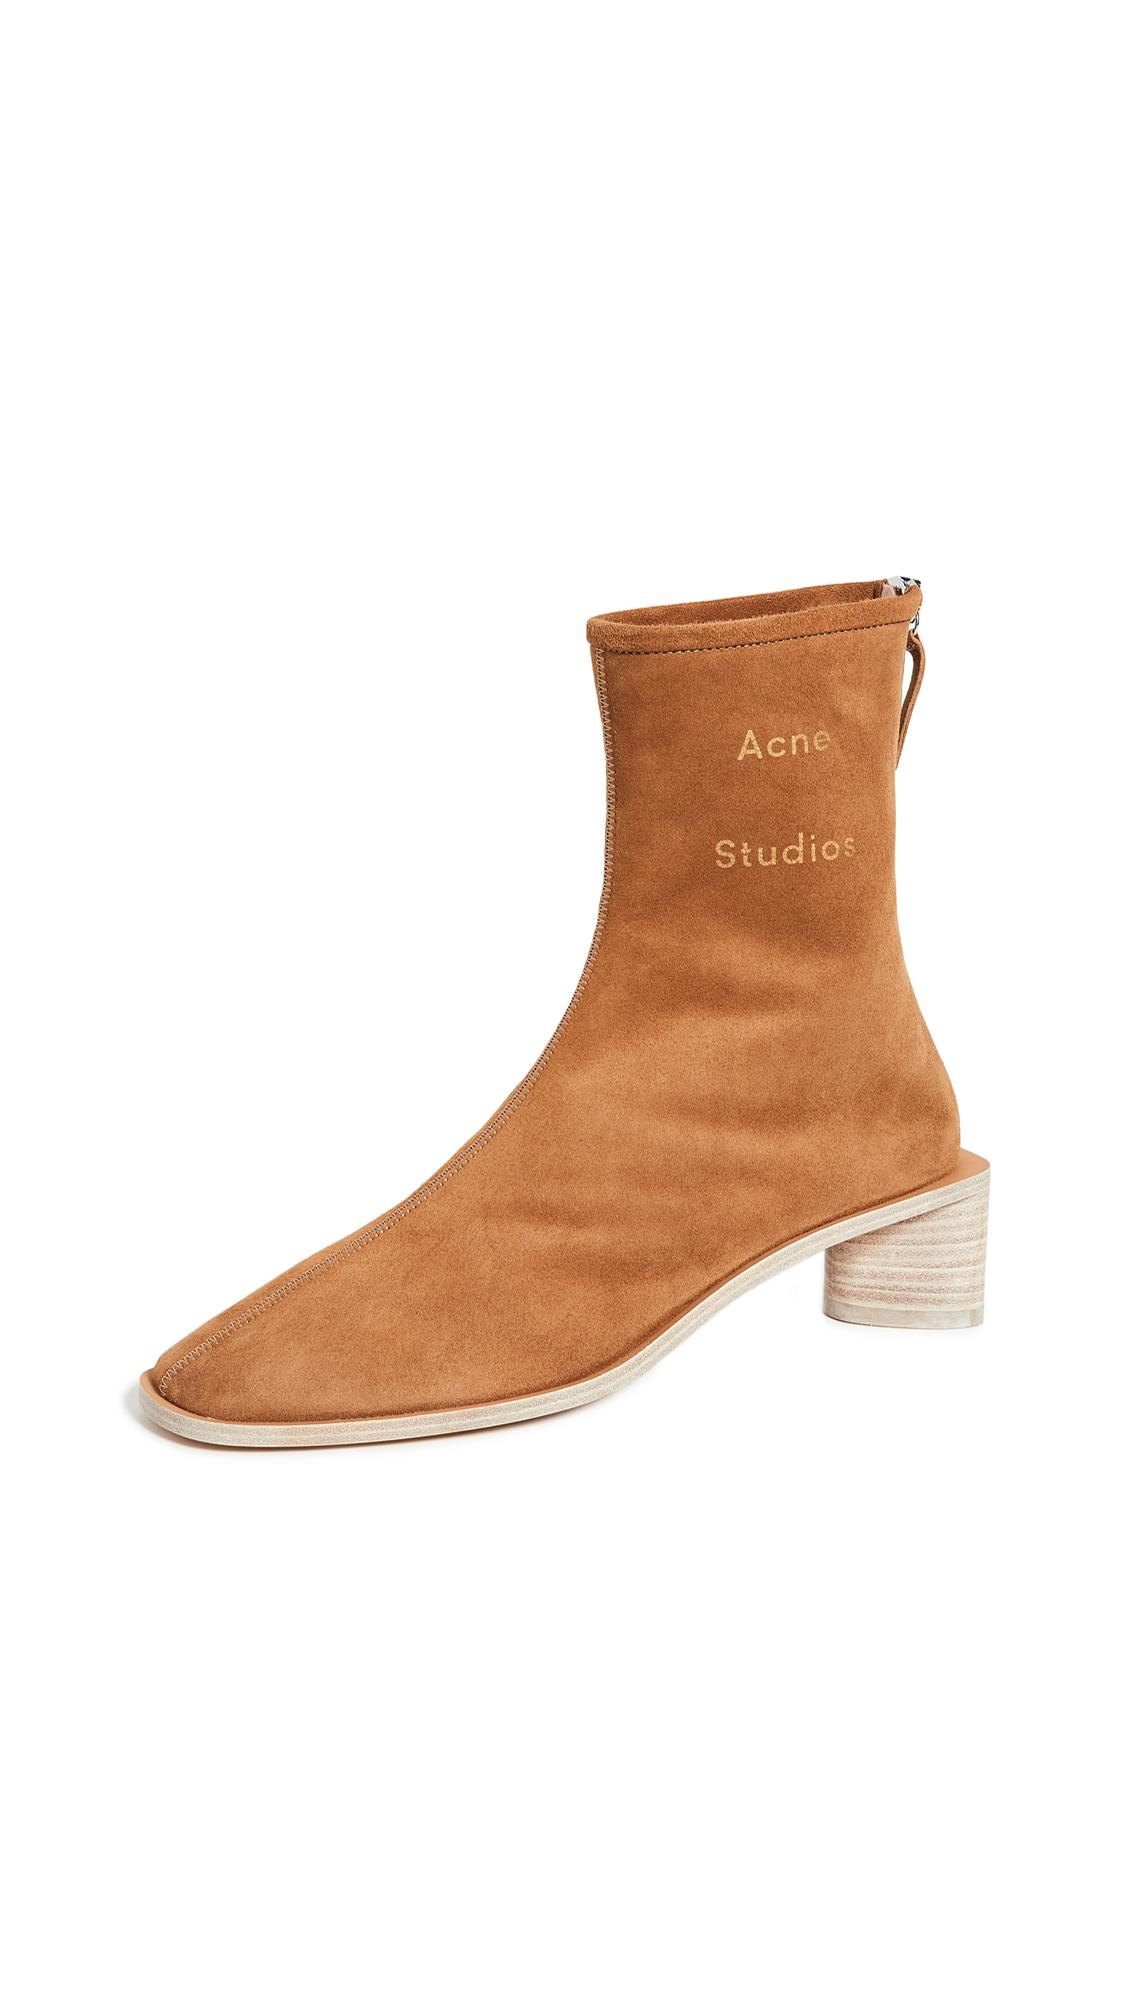 Buy Acne Studios online - photo of Acne Studios Branded Suede Booties